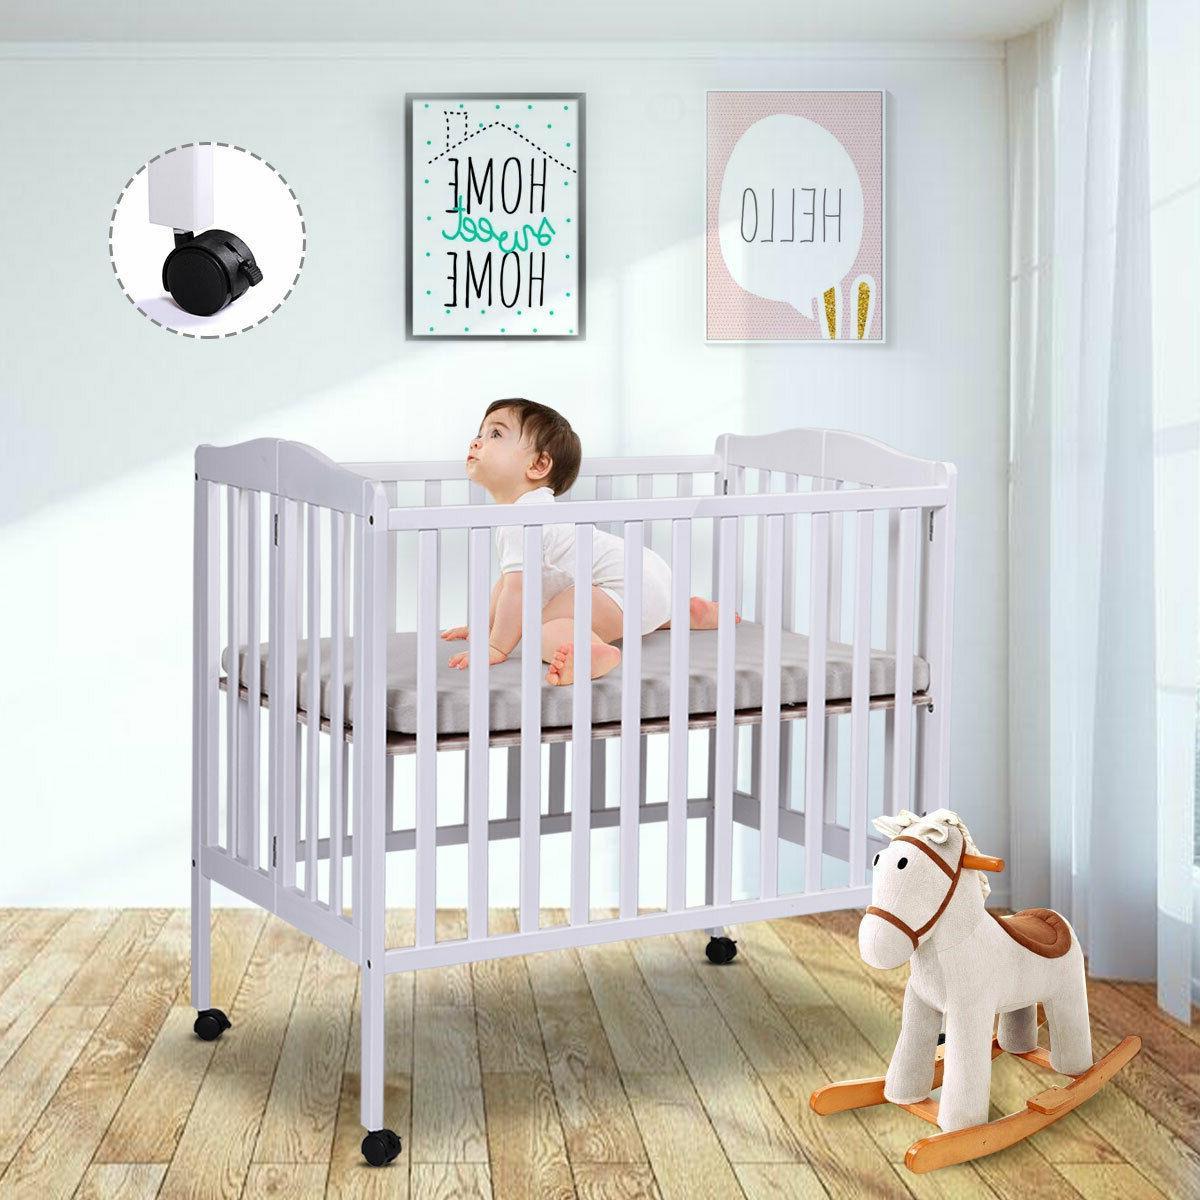 TOBBI-SAFE Nursery Bed Infant w/Mattress